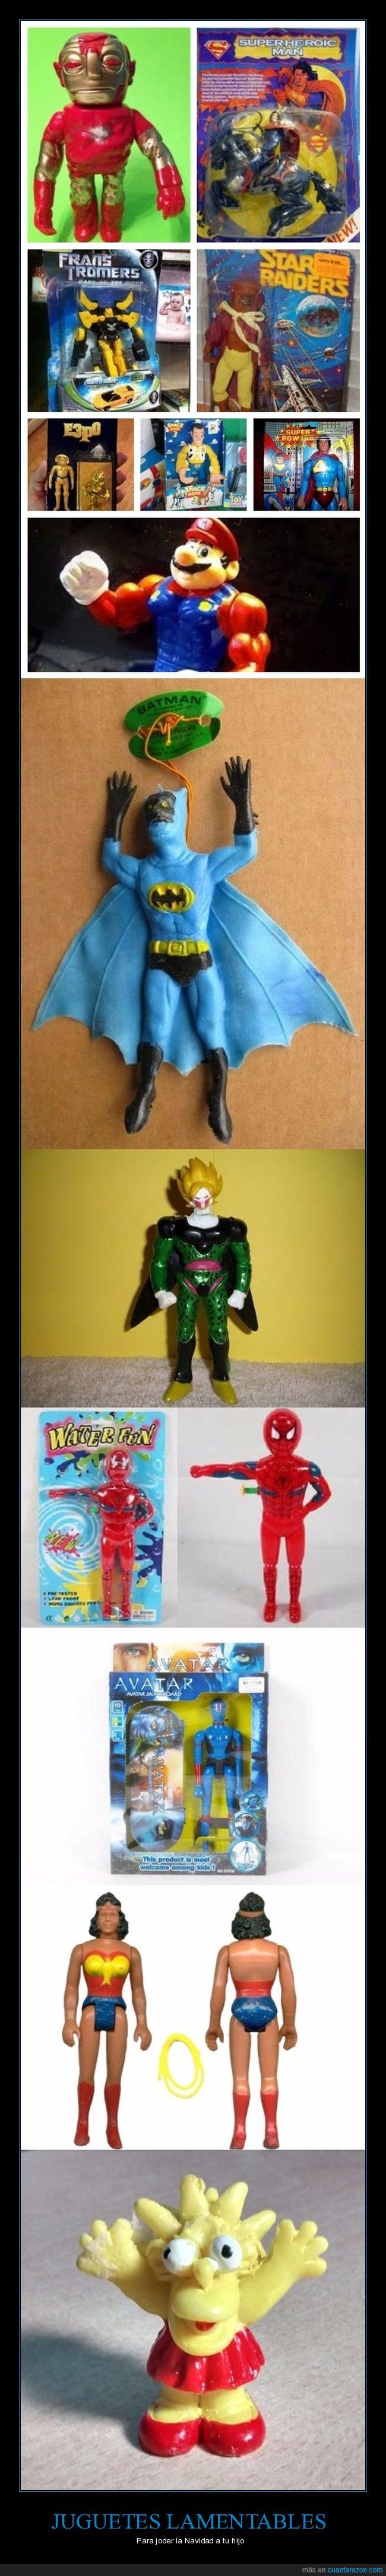 cutres,juguetes,malhechos